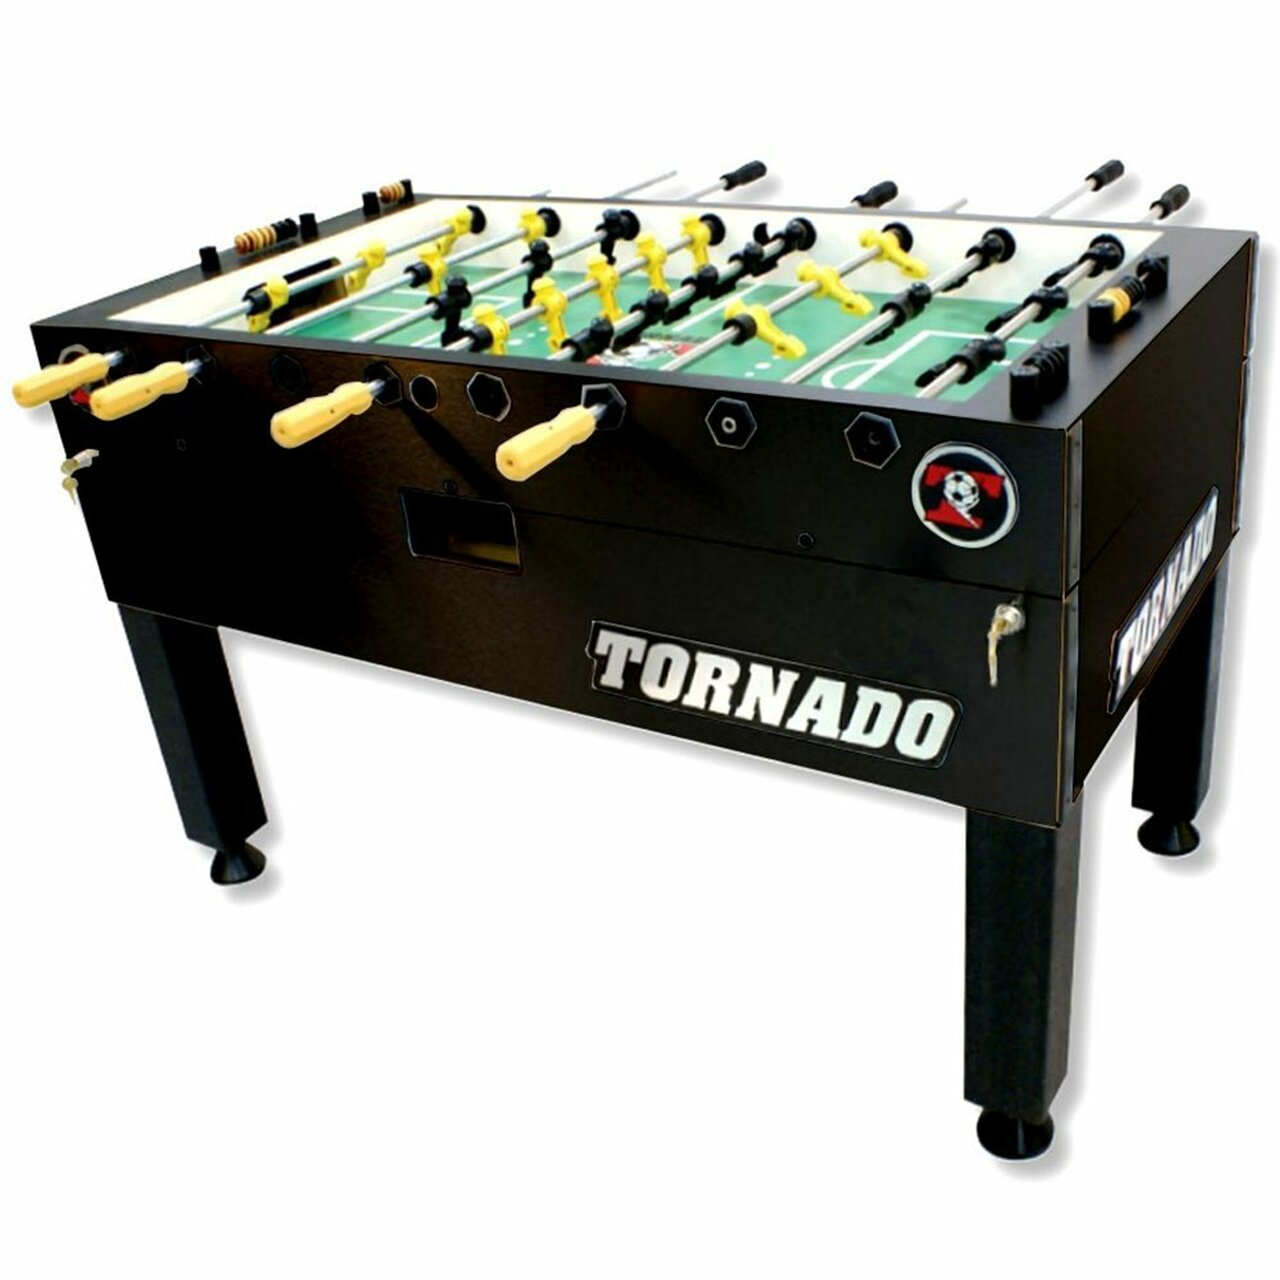 Tornado T 3000 Foosball Table Black